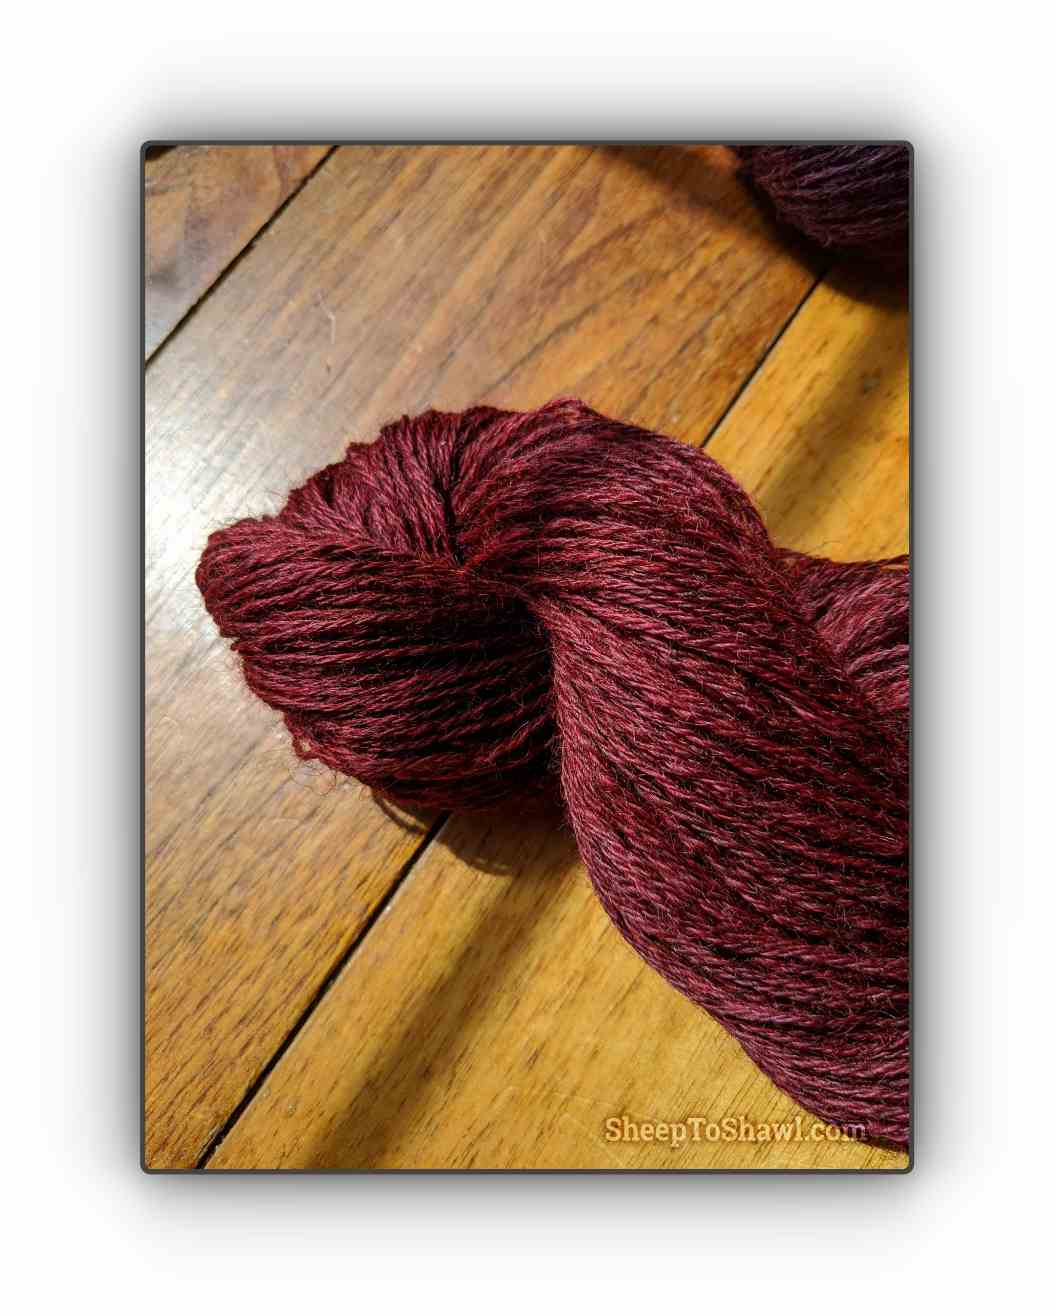 Snug Valley Coopworth Yarn